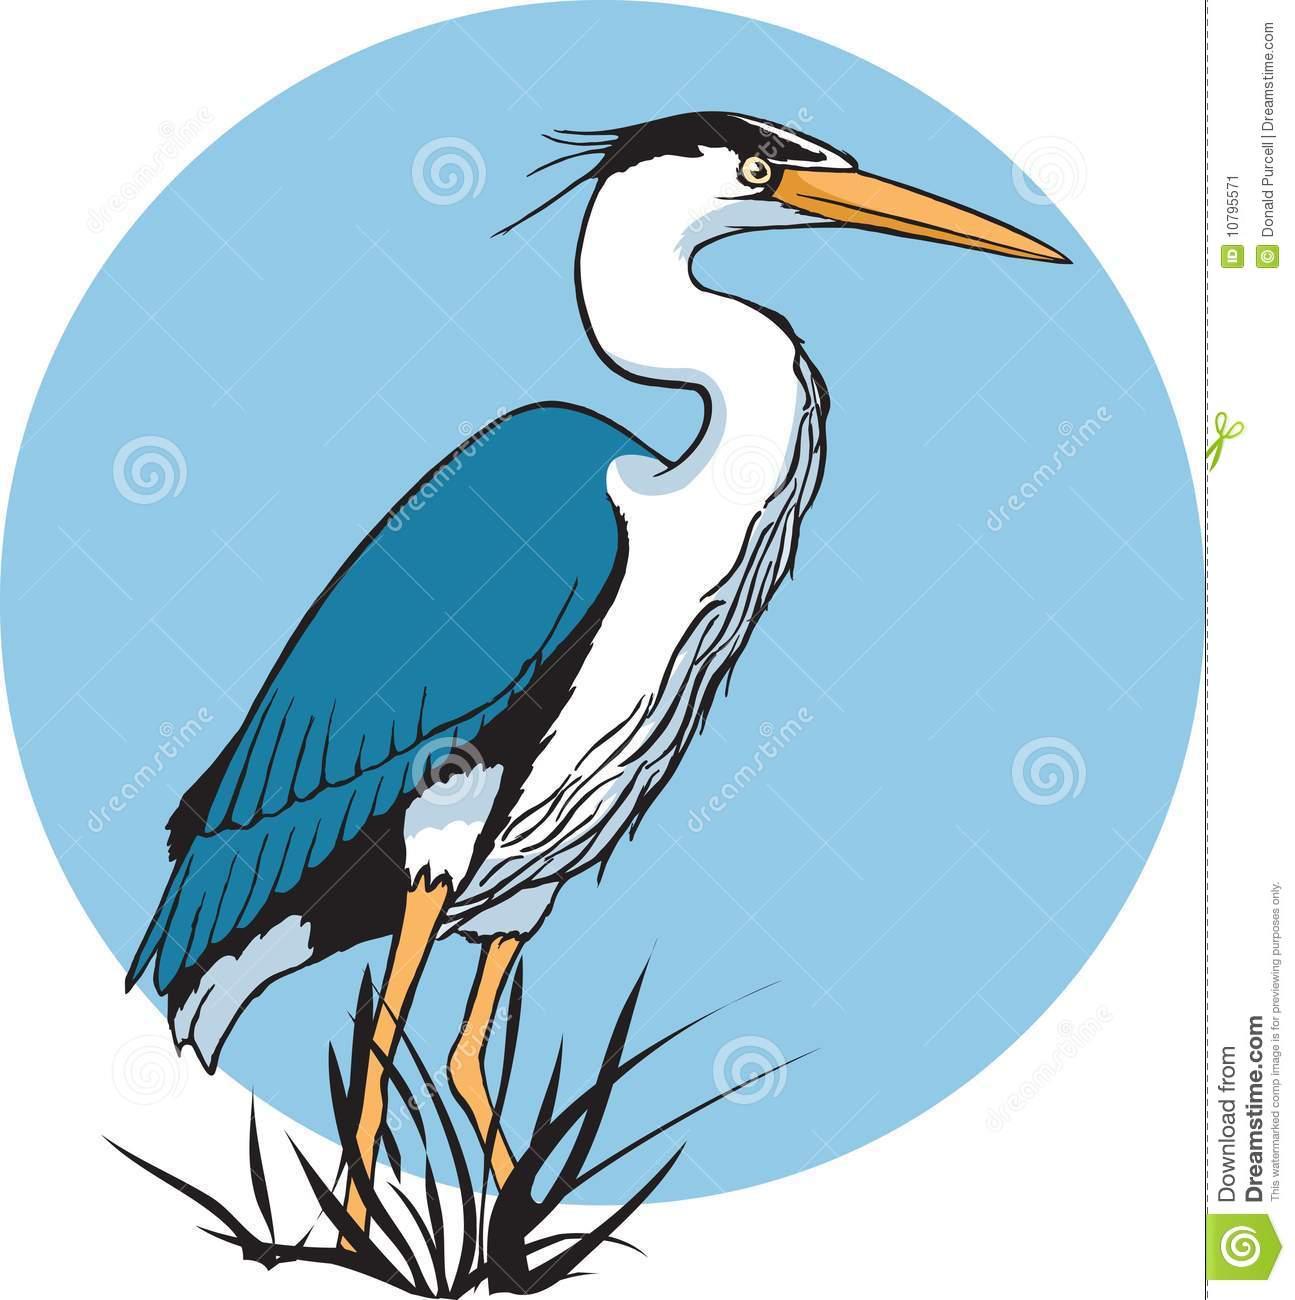 Heron Stock Image.